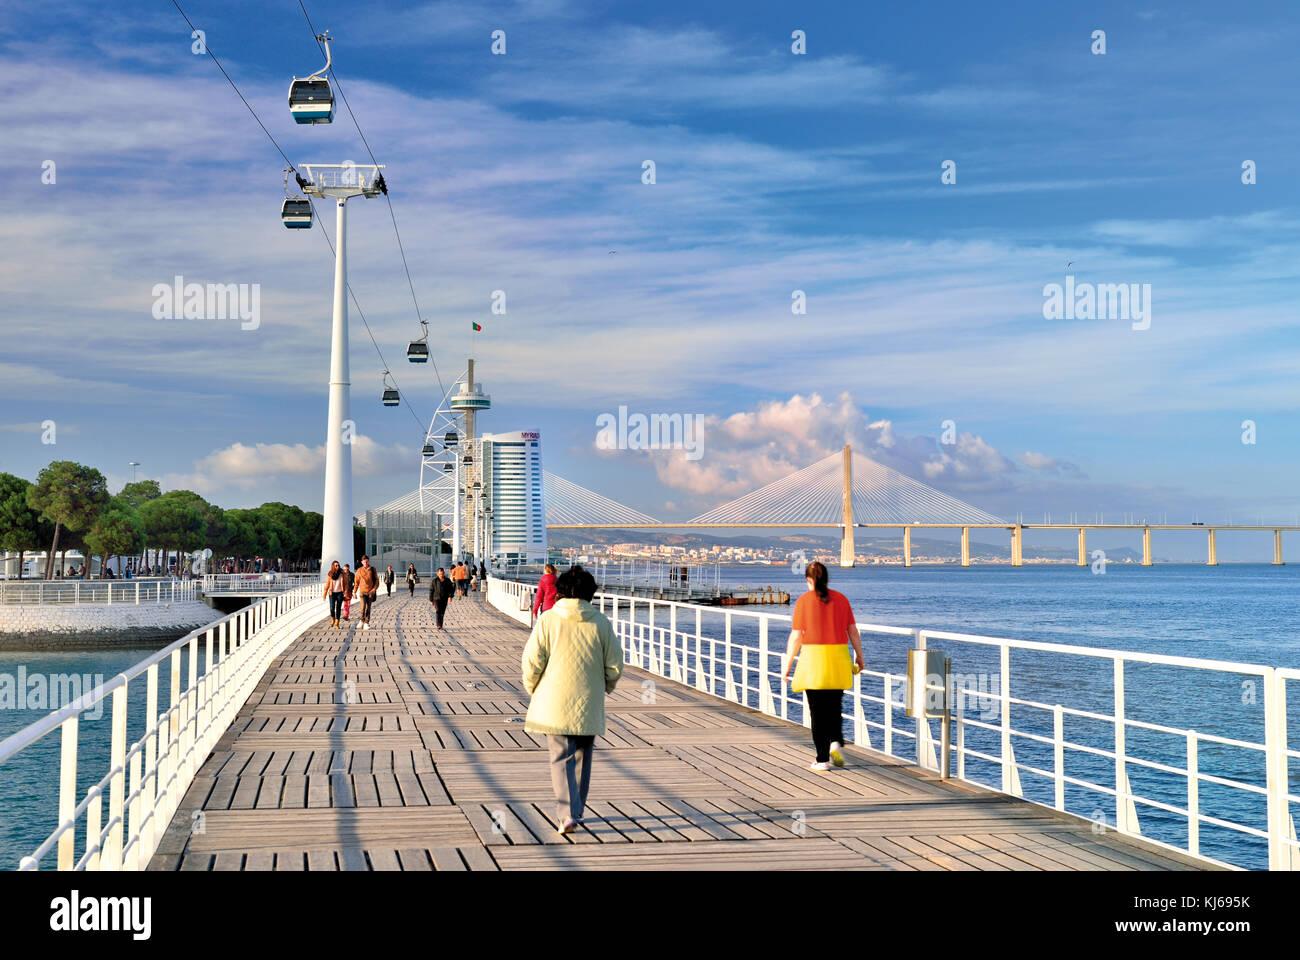 Leute, die Fußgängerbrücke durch moderne Architektur umgeben, Seilbahn und Vasco da Gama Brücke Stockbild